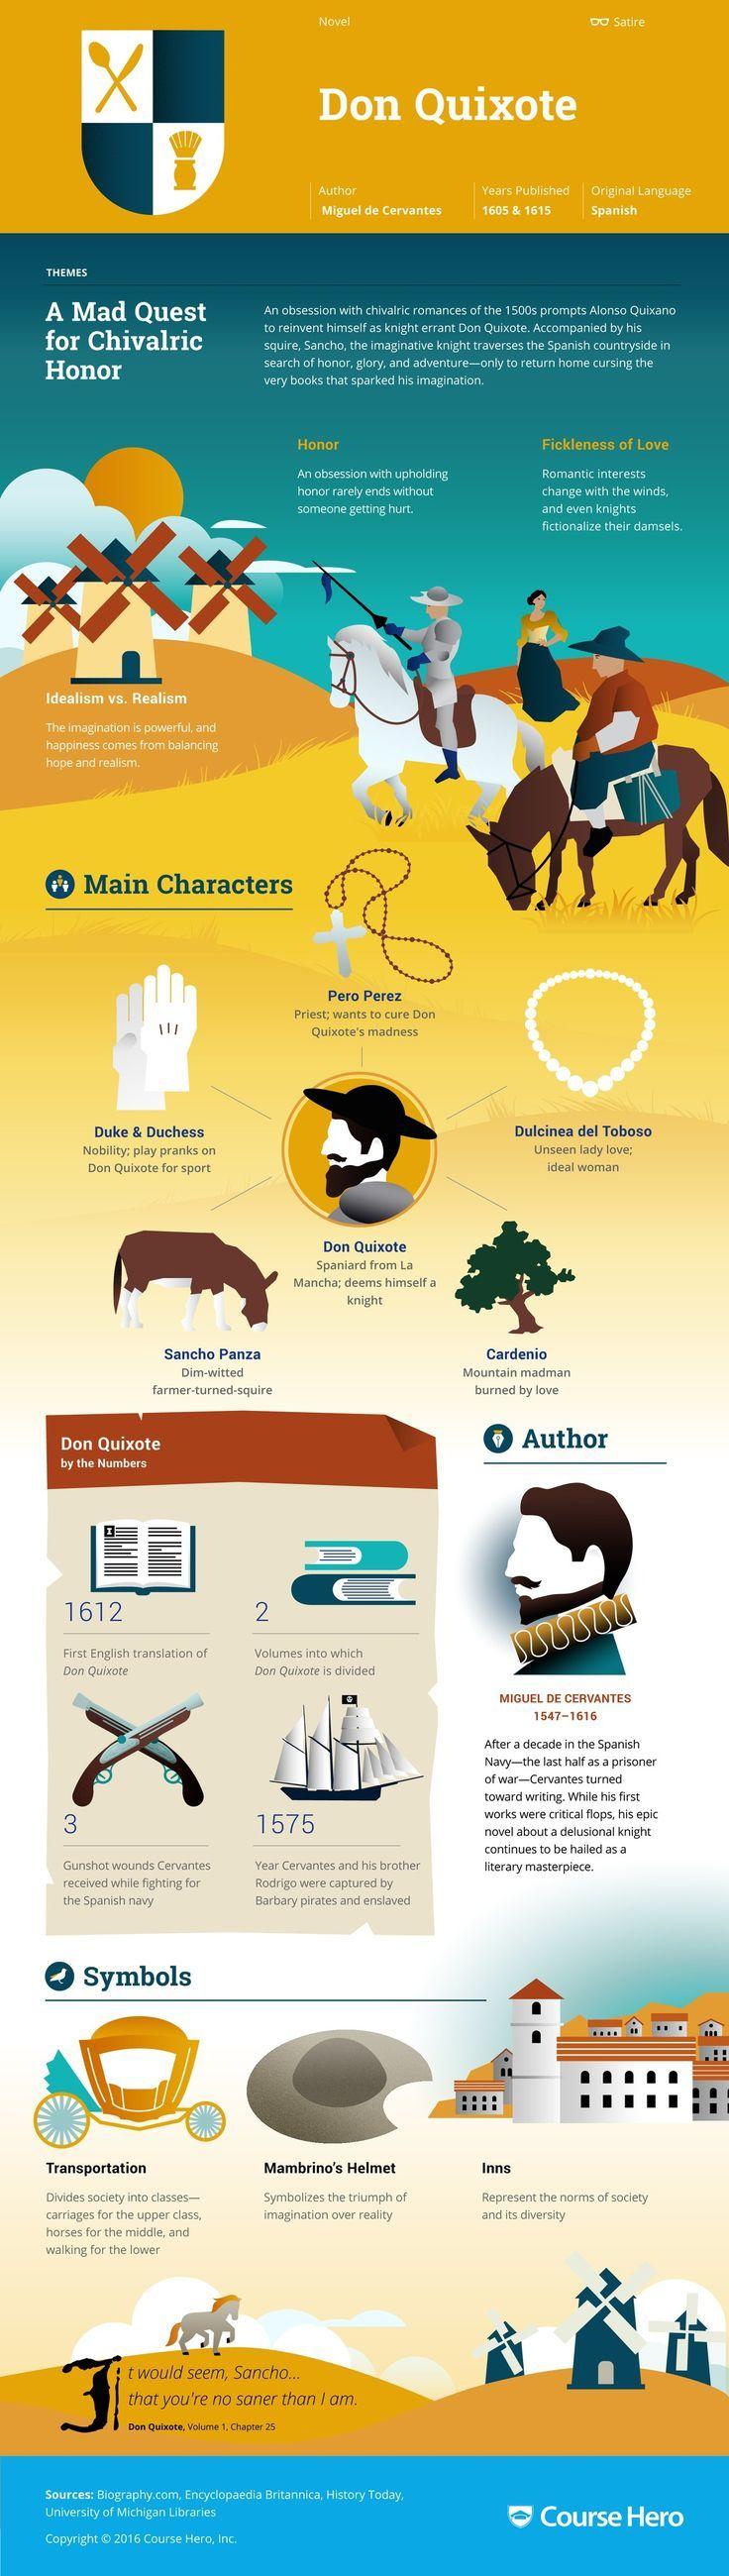 Don Quixote Infographic | Course Hero